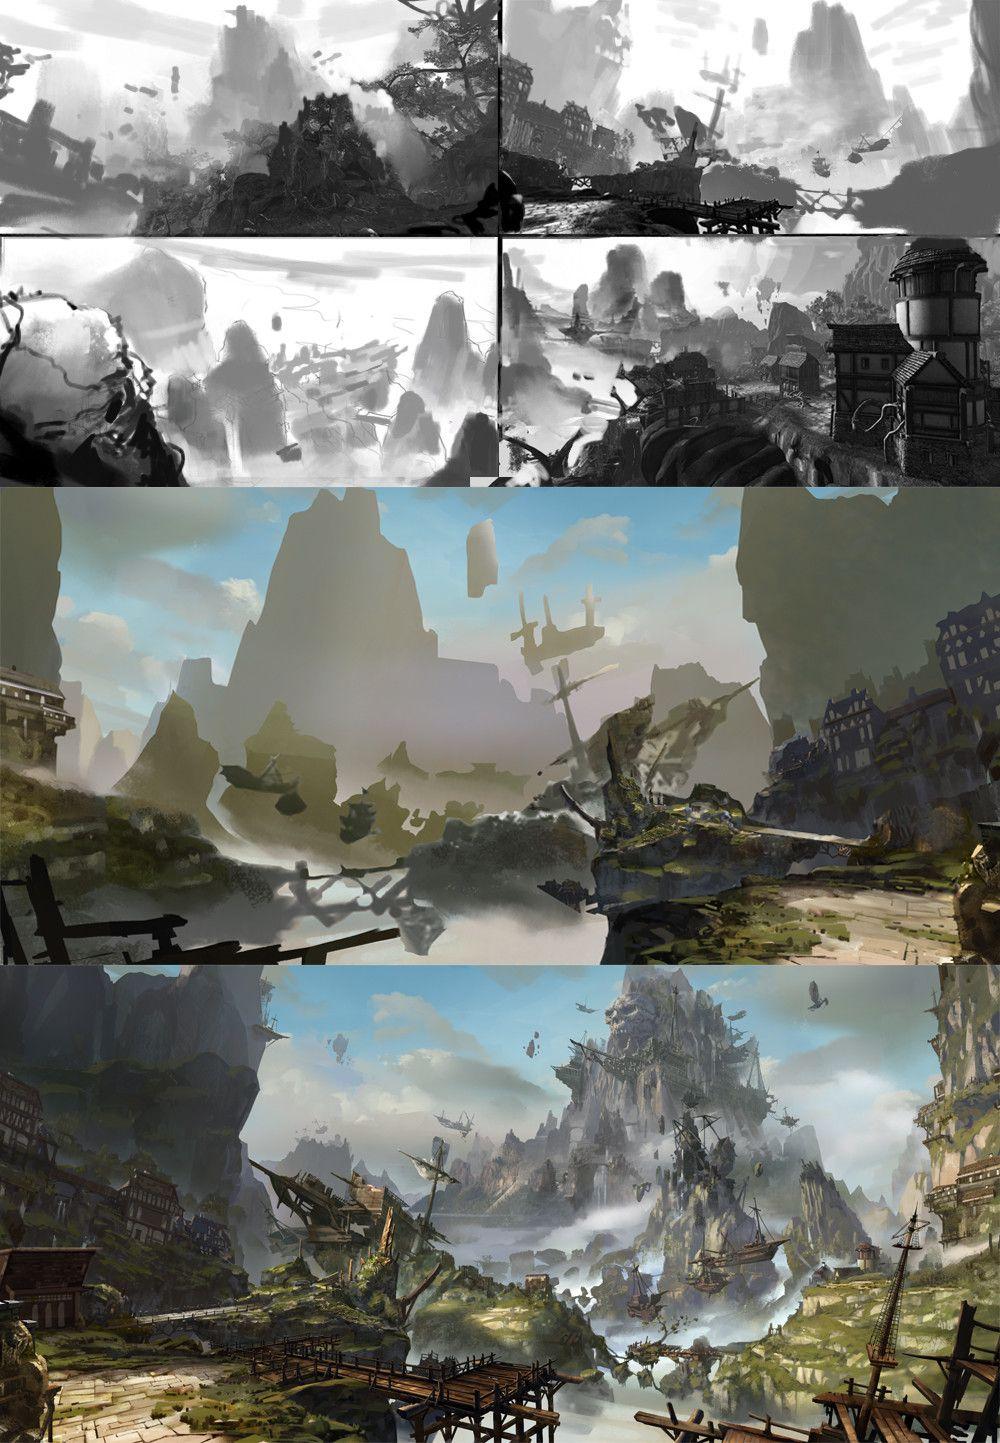 Pirate Boat Jiang Fan Game Concept Art Landscape Art Digital Painting Techniques